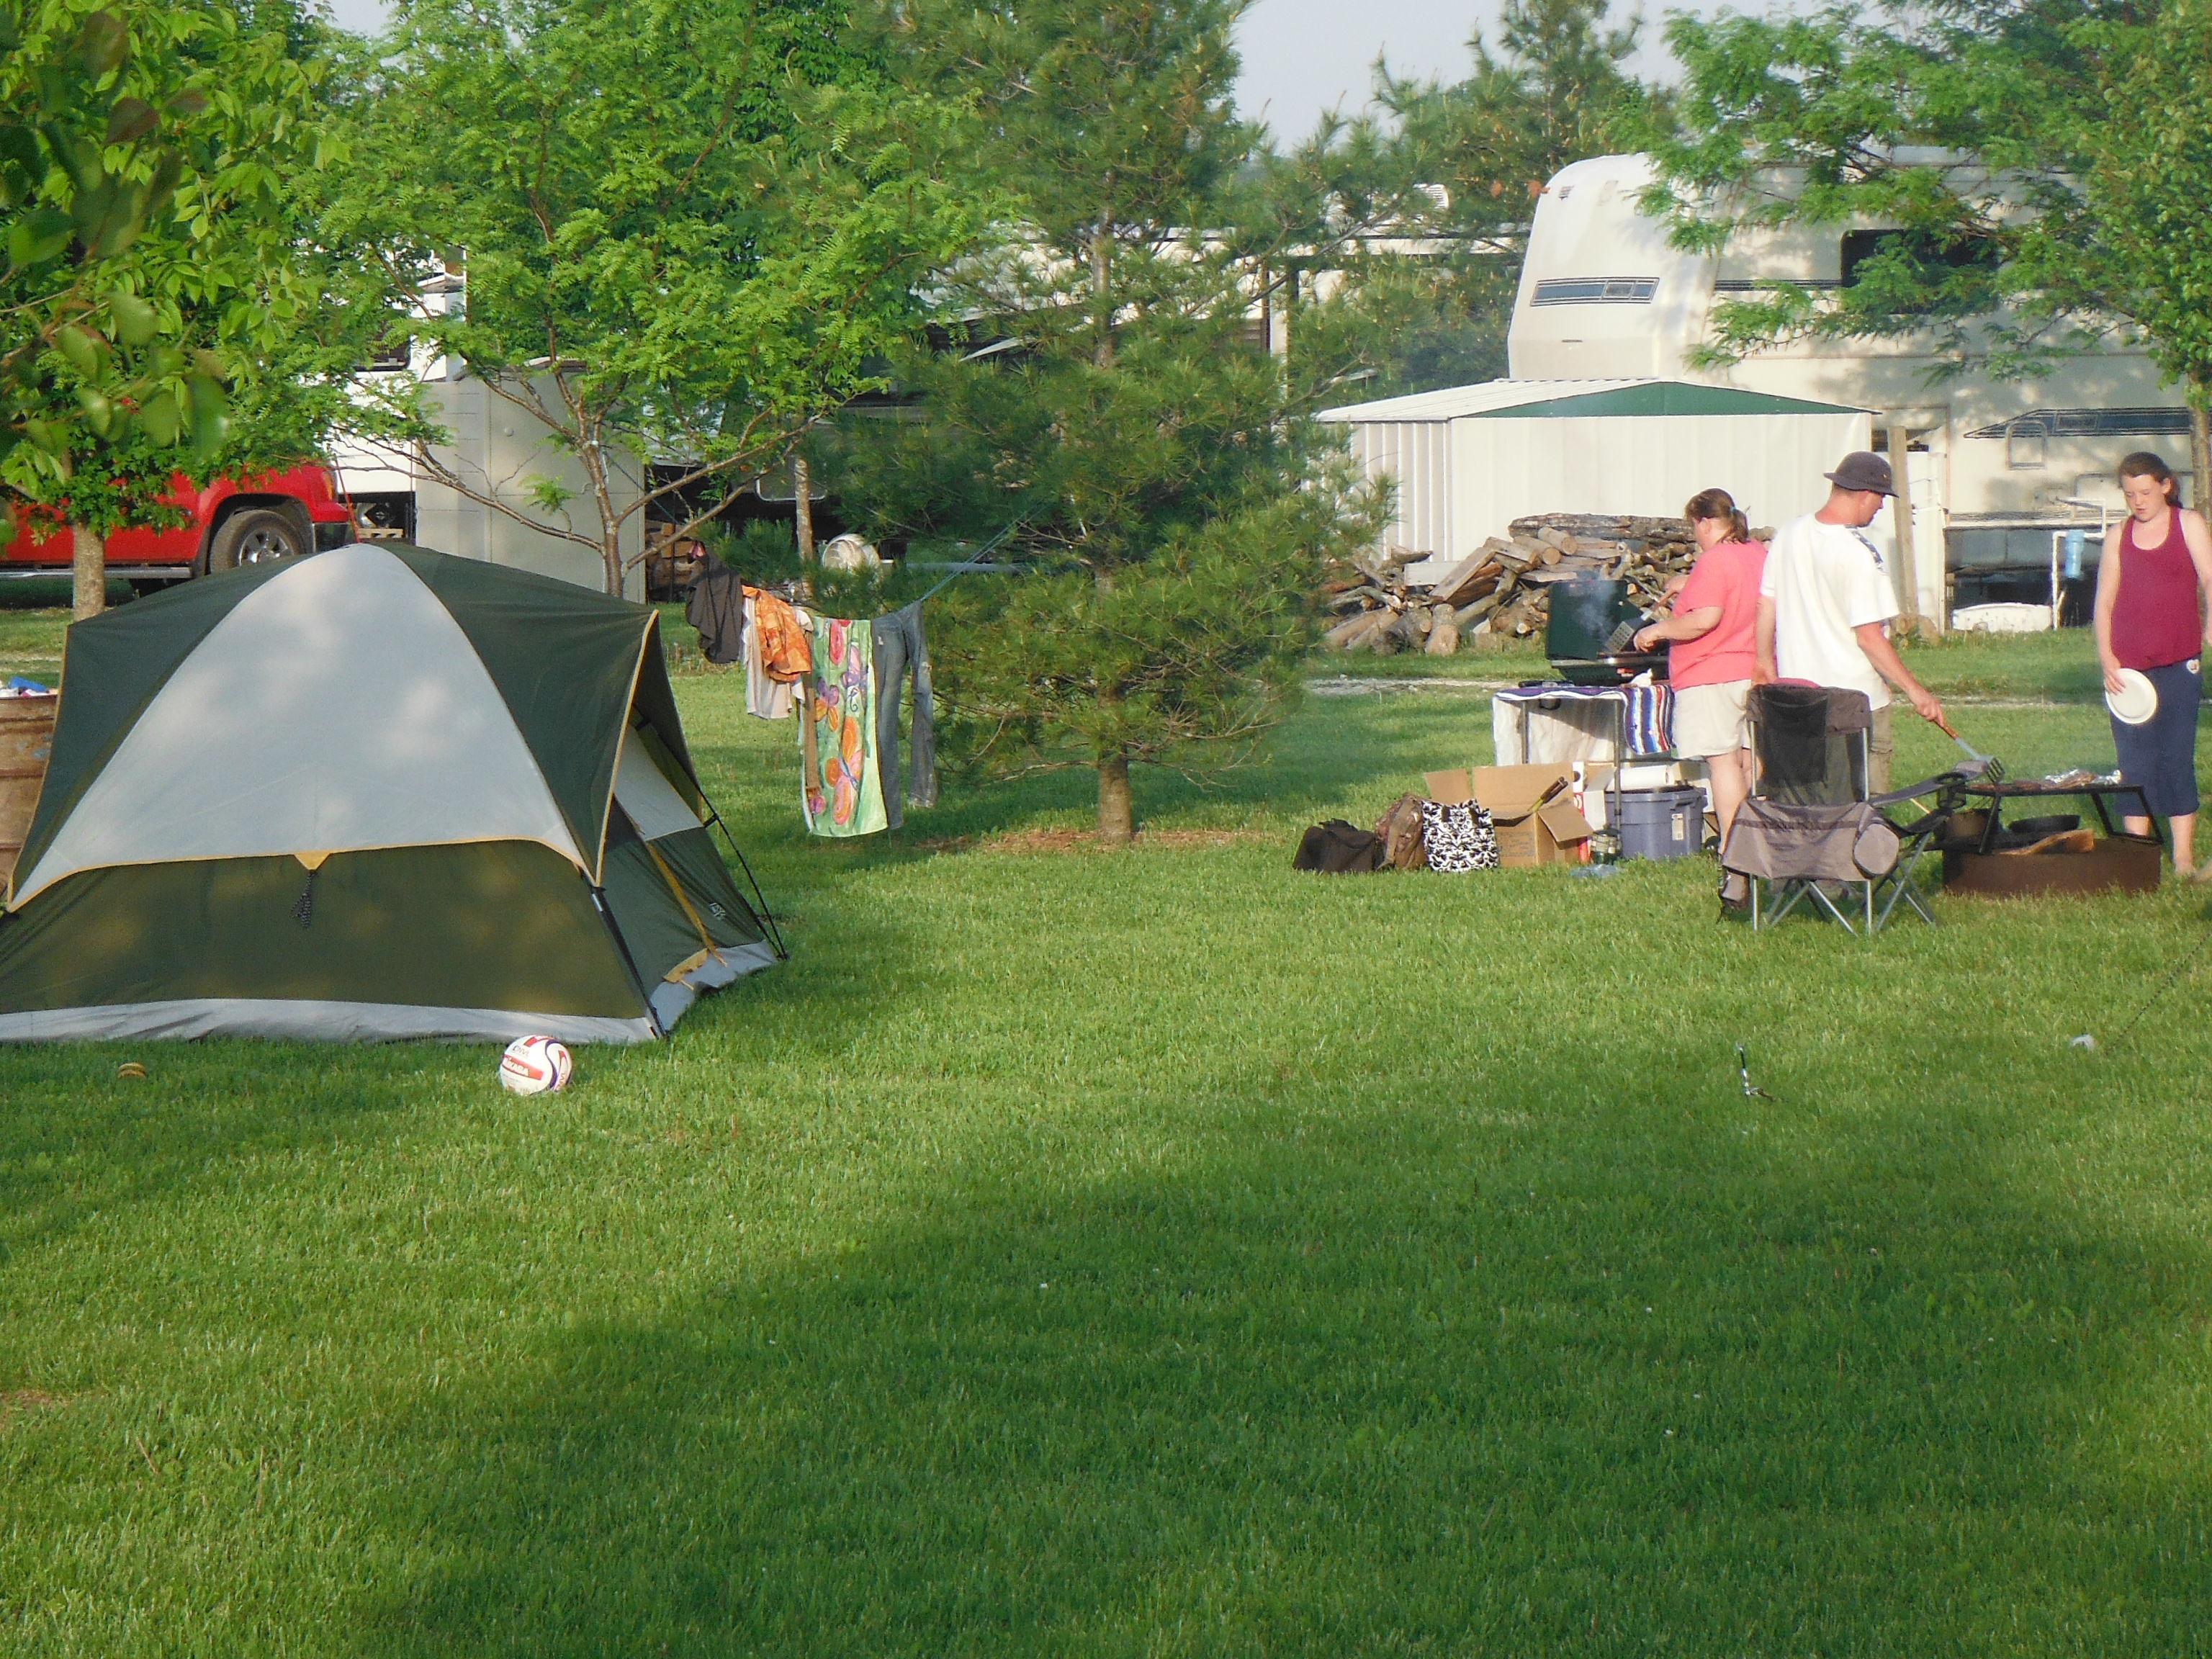 cabinfeveril.com - Tent area